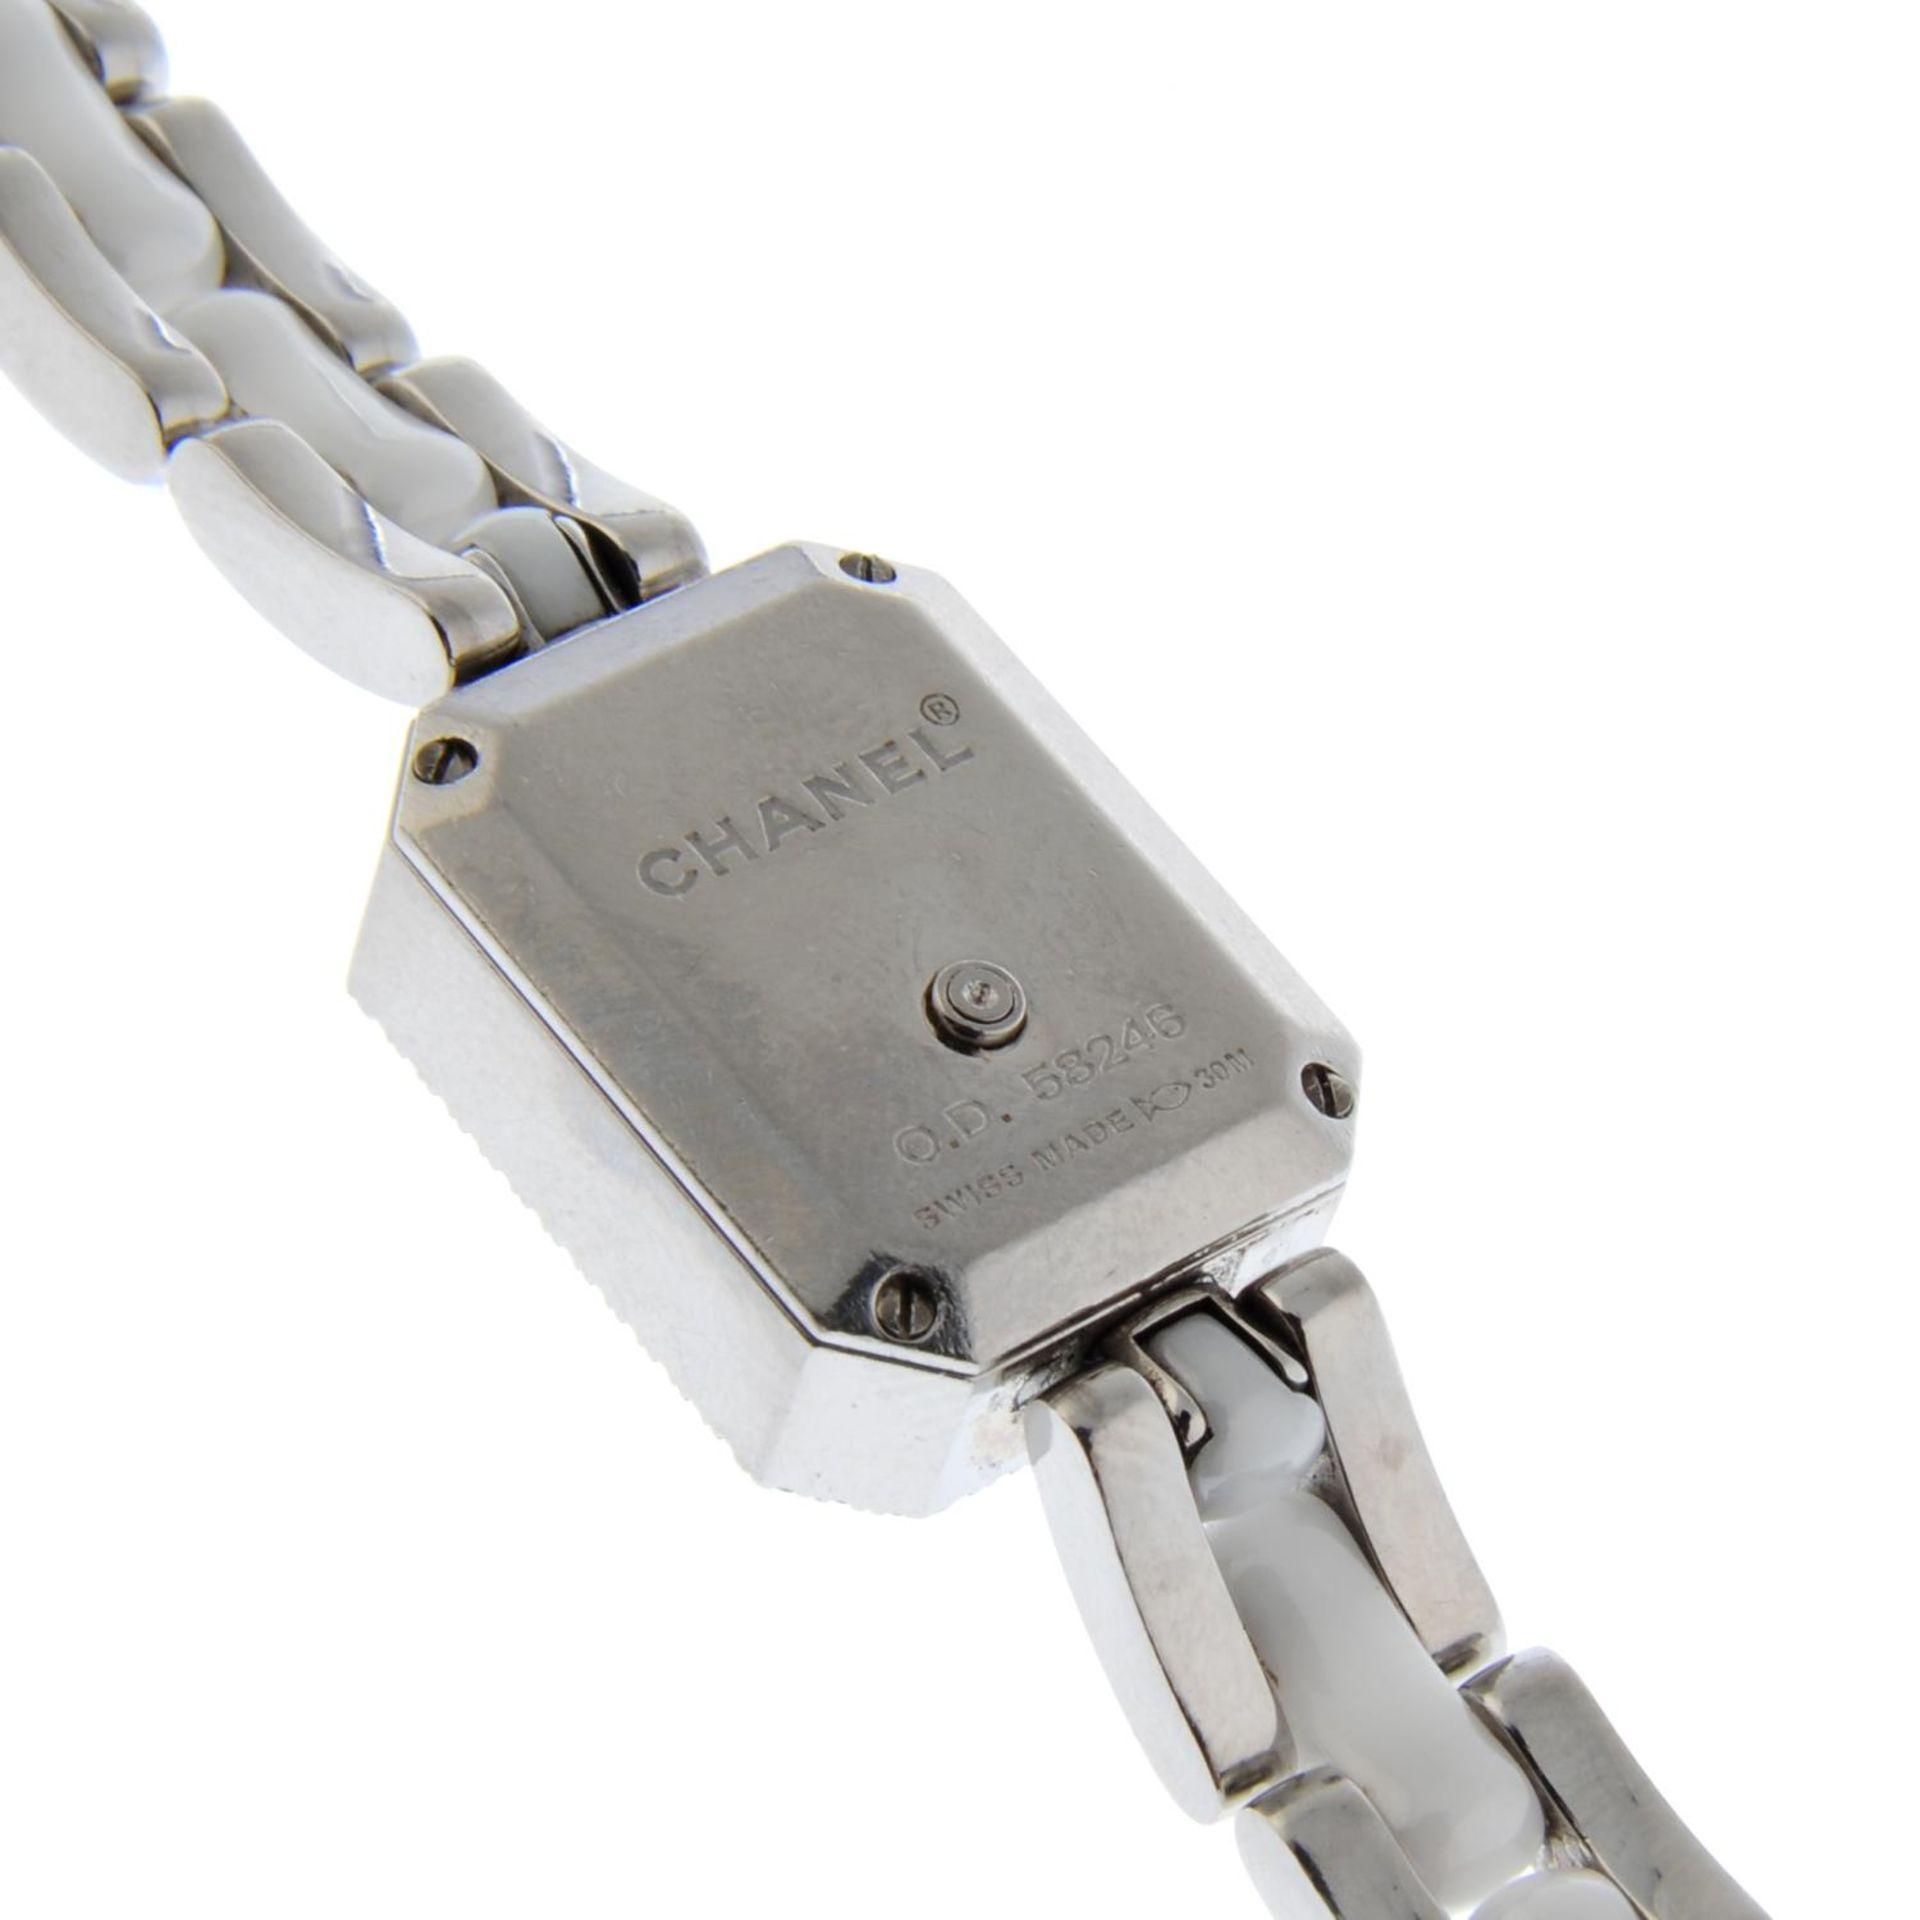 CHANEL - a Premiere bracelet watch. - Bild 2 aus 5